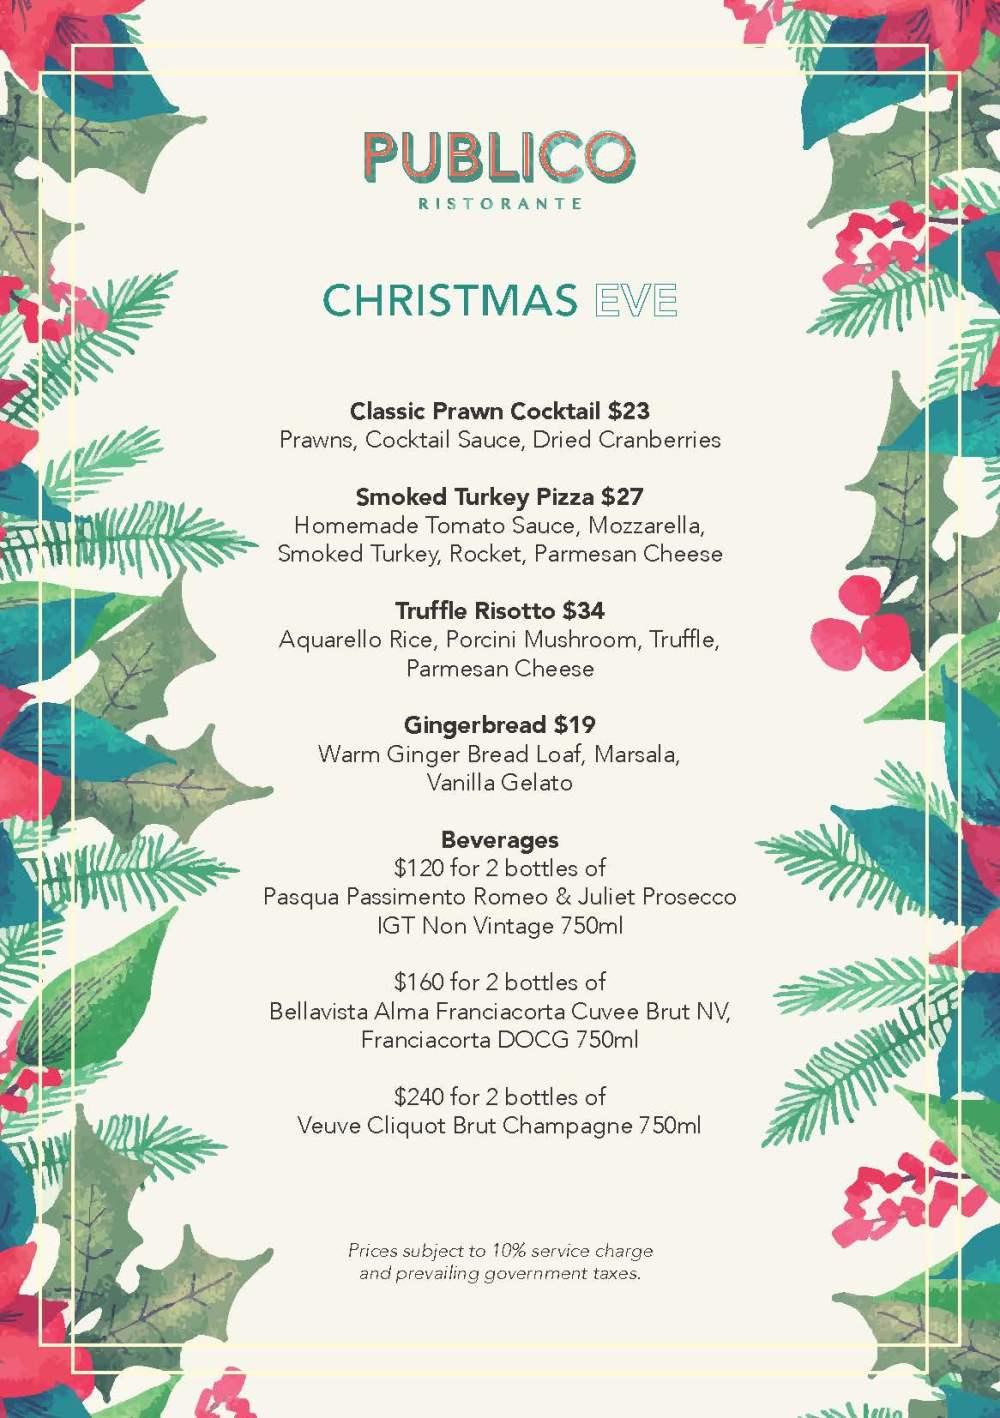 _Publico Ristorante - Additional Christmas Brunch Specials - 24th December